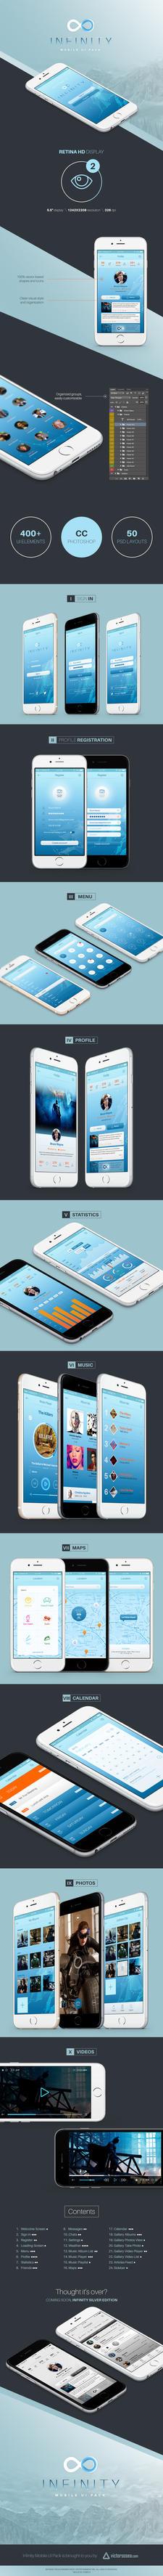 Infinity Mobile UI Free PSD by victorsosea